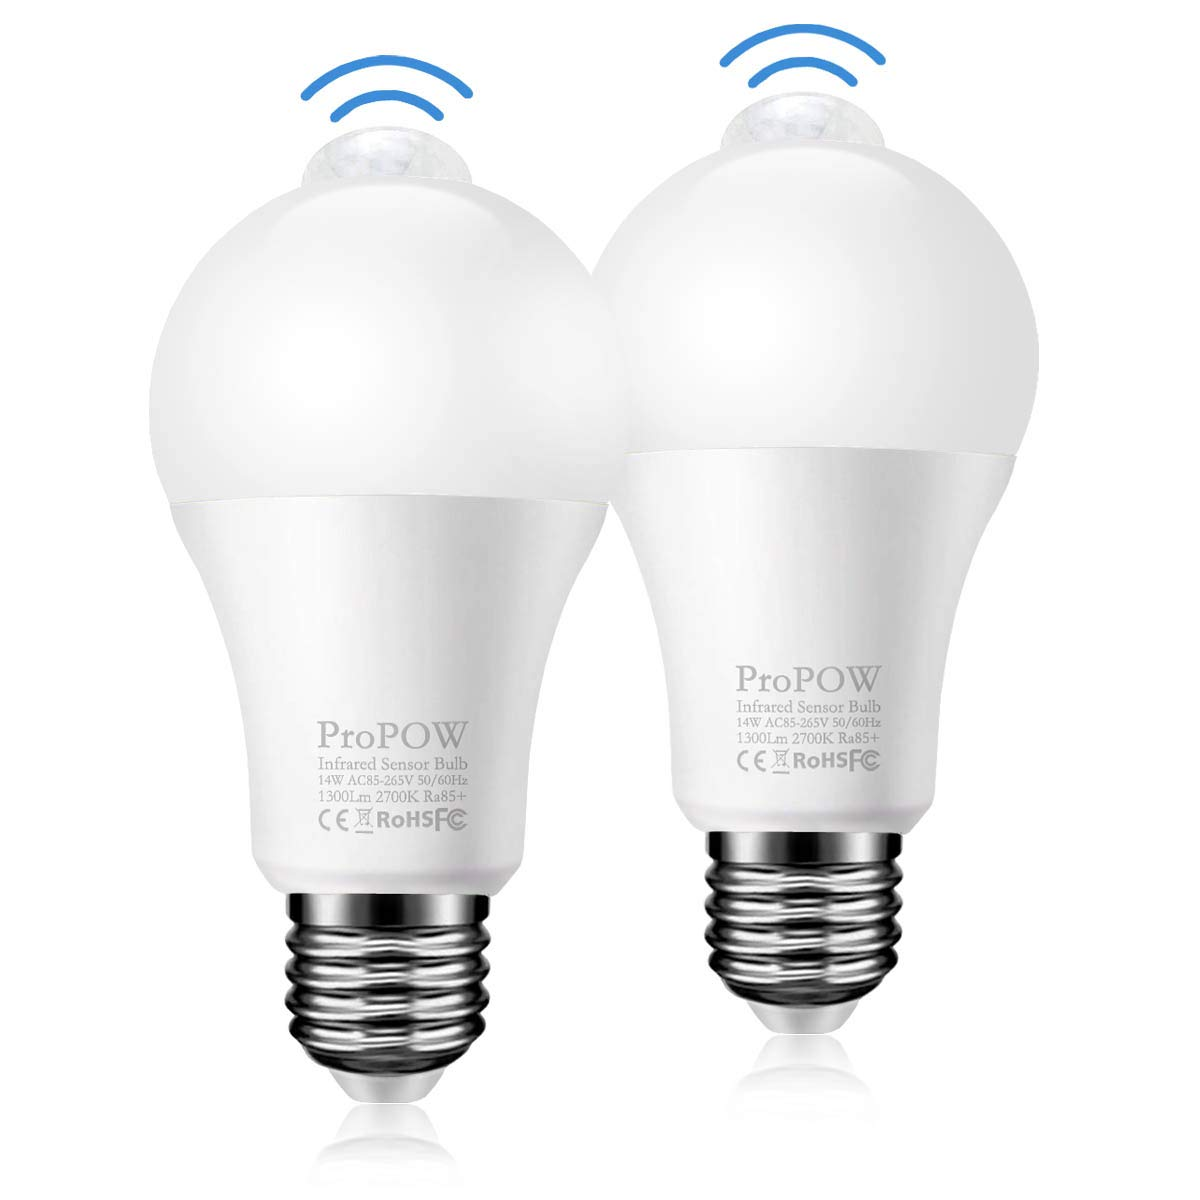 Motion Sensor Light Bulb,ProPOW 14W PIR LED Bulbs A19 E26 Smart Motion Detector Bulbs Auto on/Off Night Lights for Stairs,Garage,Corridor,Patio,Carports(1300lumen,Soft White,2 Pack)